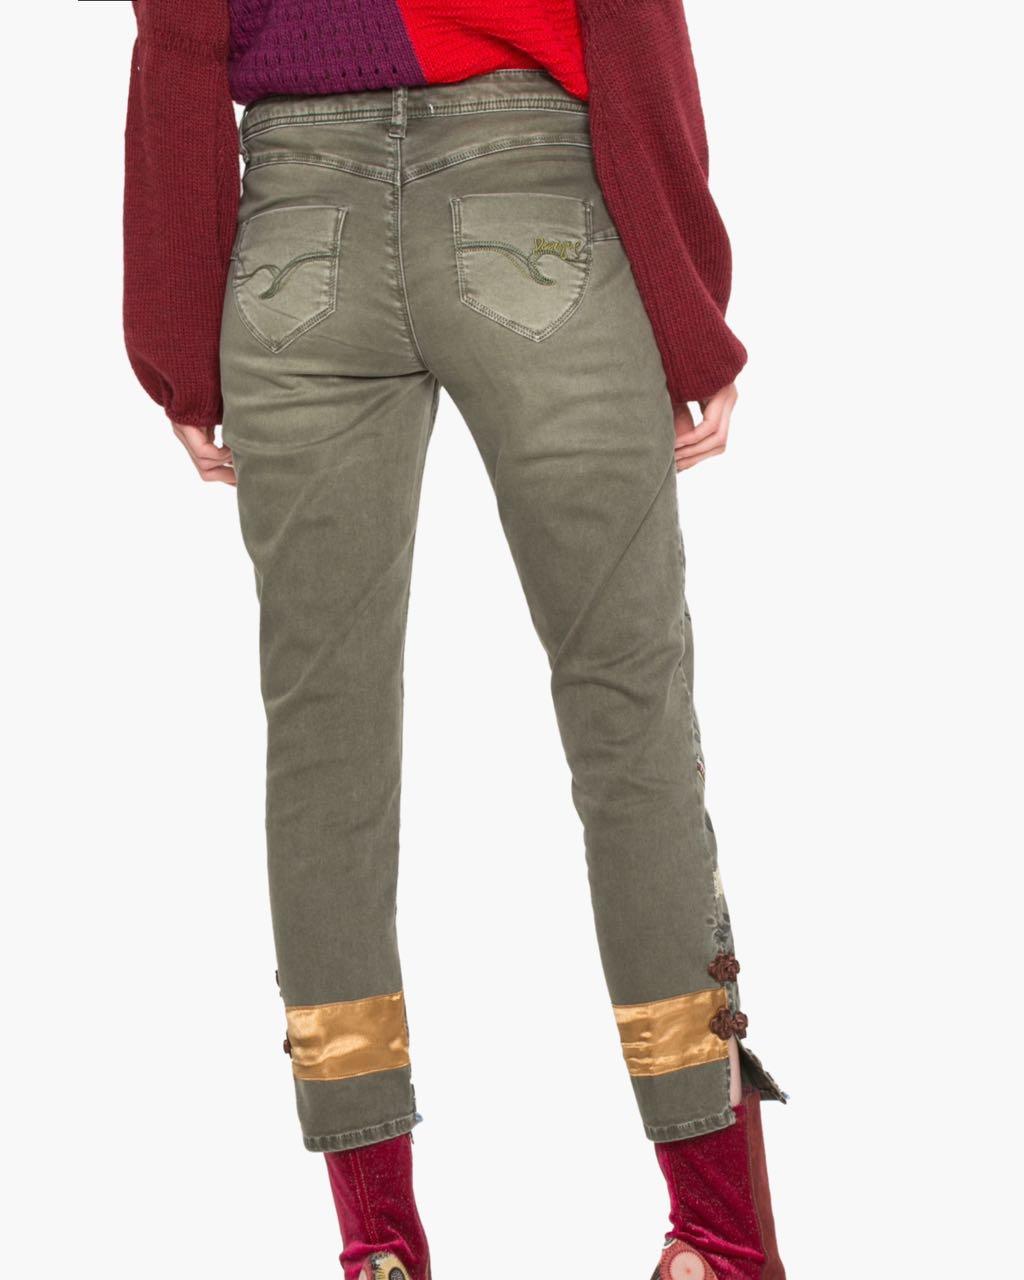 17WWPN21_6100 Desigual Pants Harry Canada